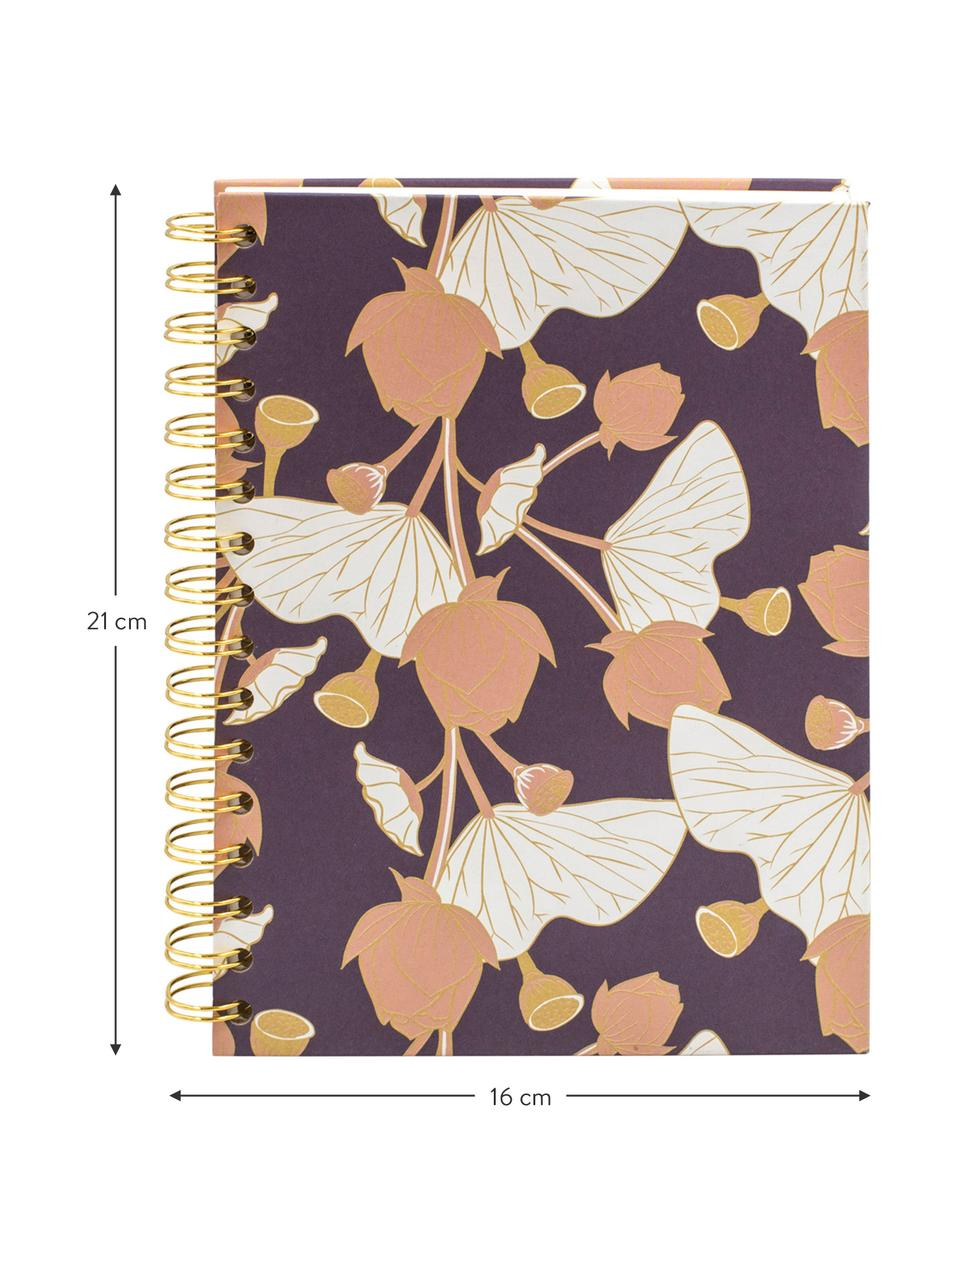 Notizbuch Lotus, Lila, Rosa, Gelb, Weiß, 16 x 21 cm